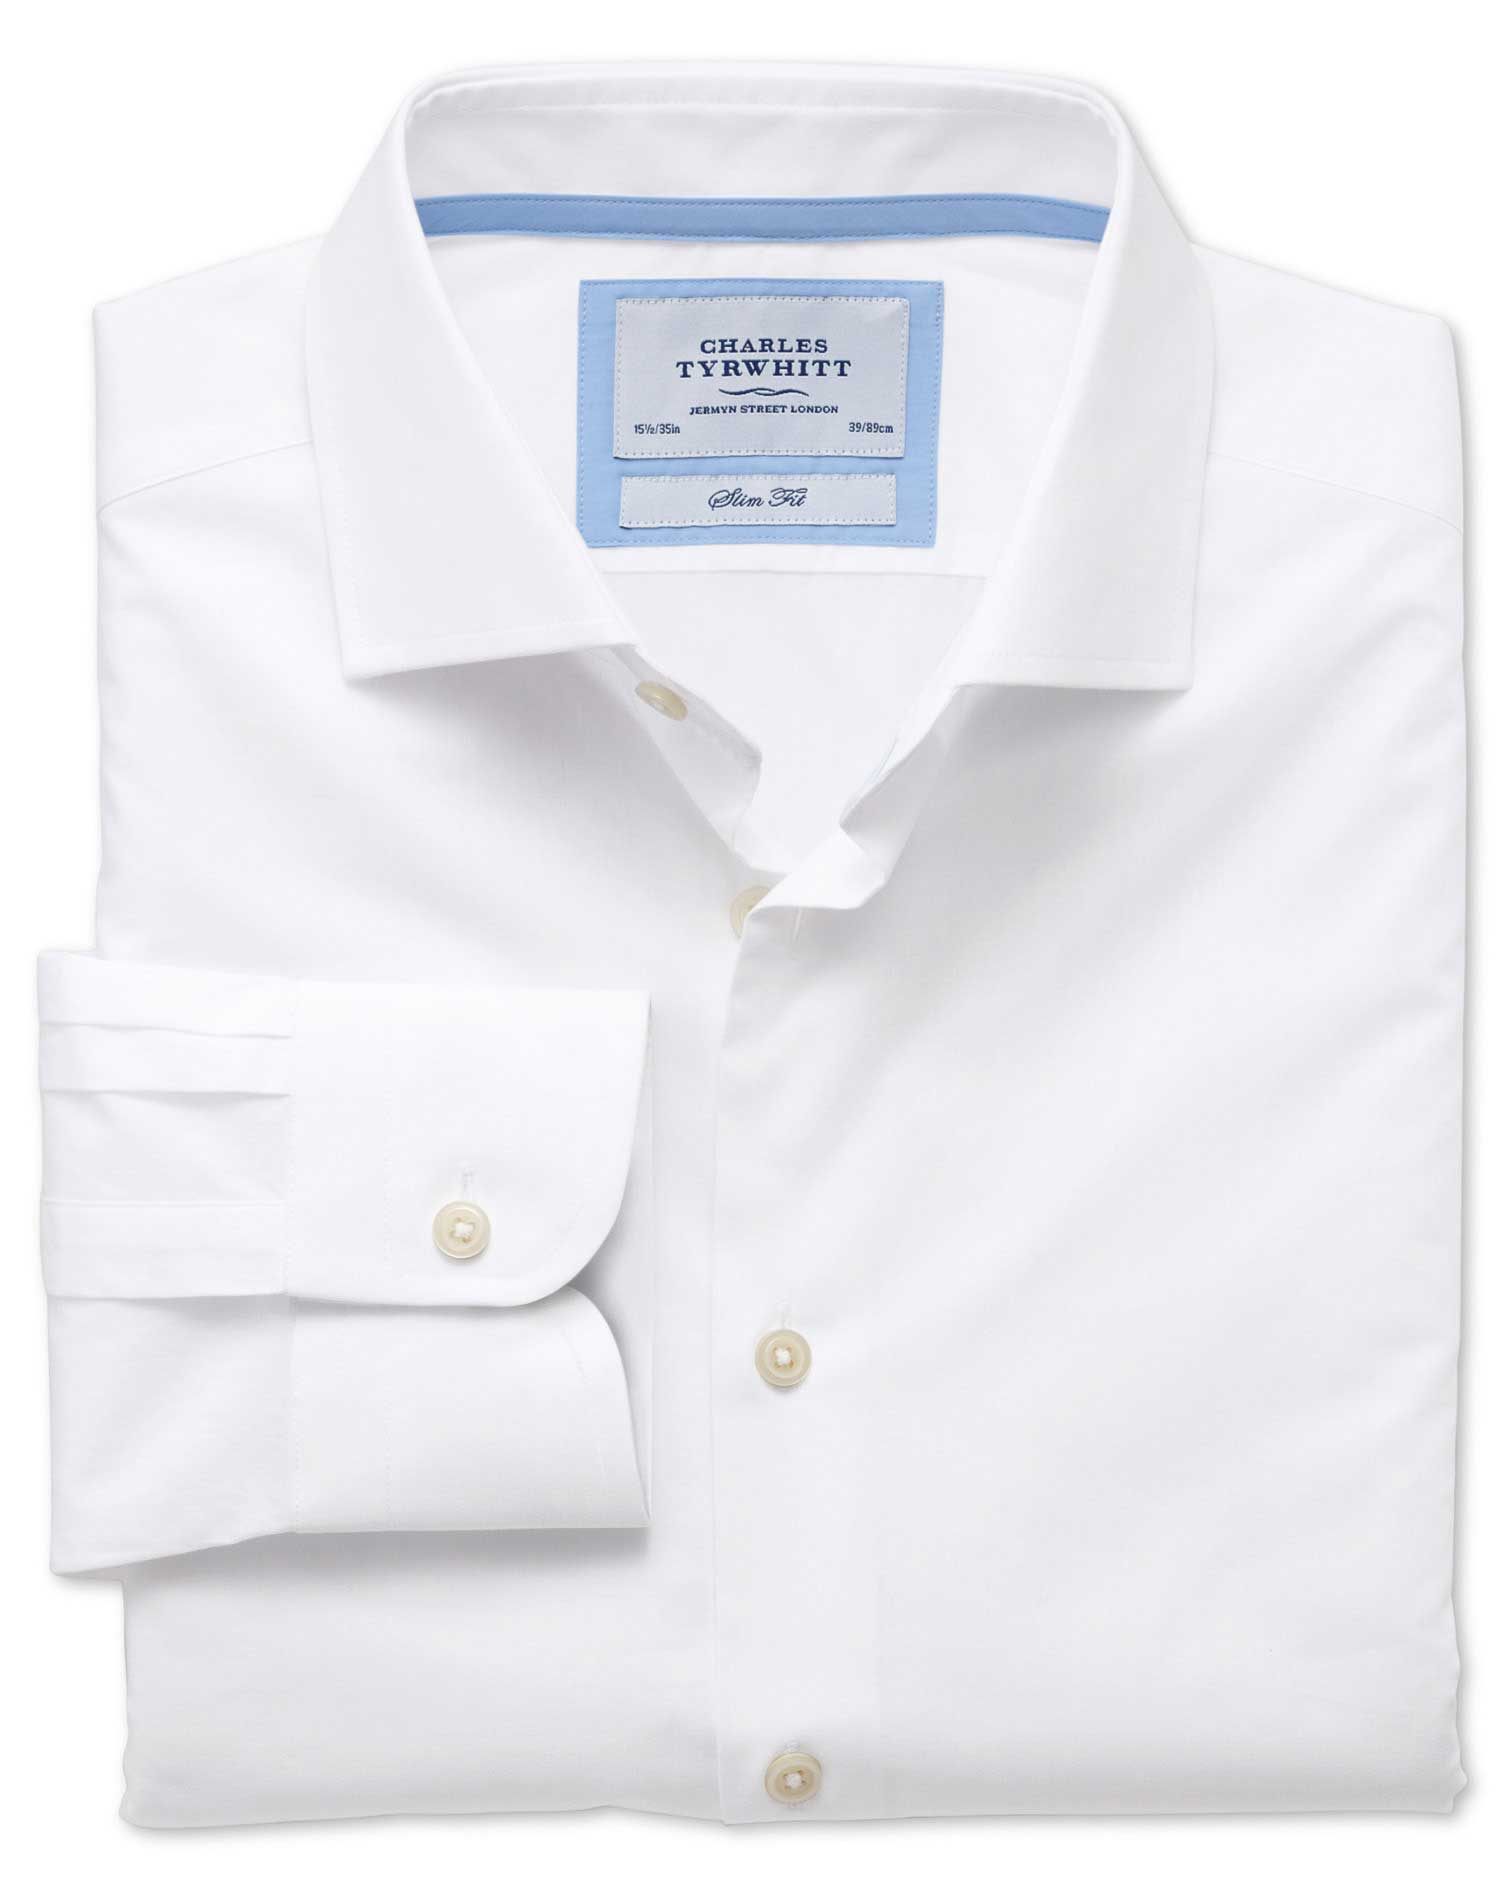 Slim Fit Semi-Cutaway Collar Business Casual White Egyptian Cotton Formal Shirt Single Cuff Size 18/